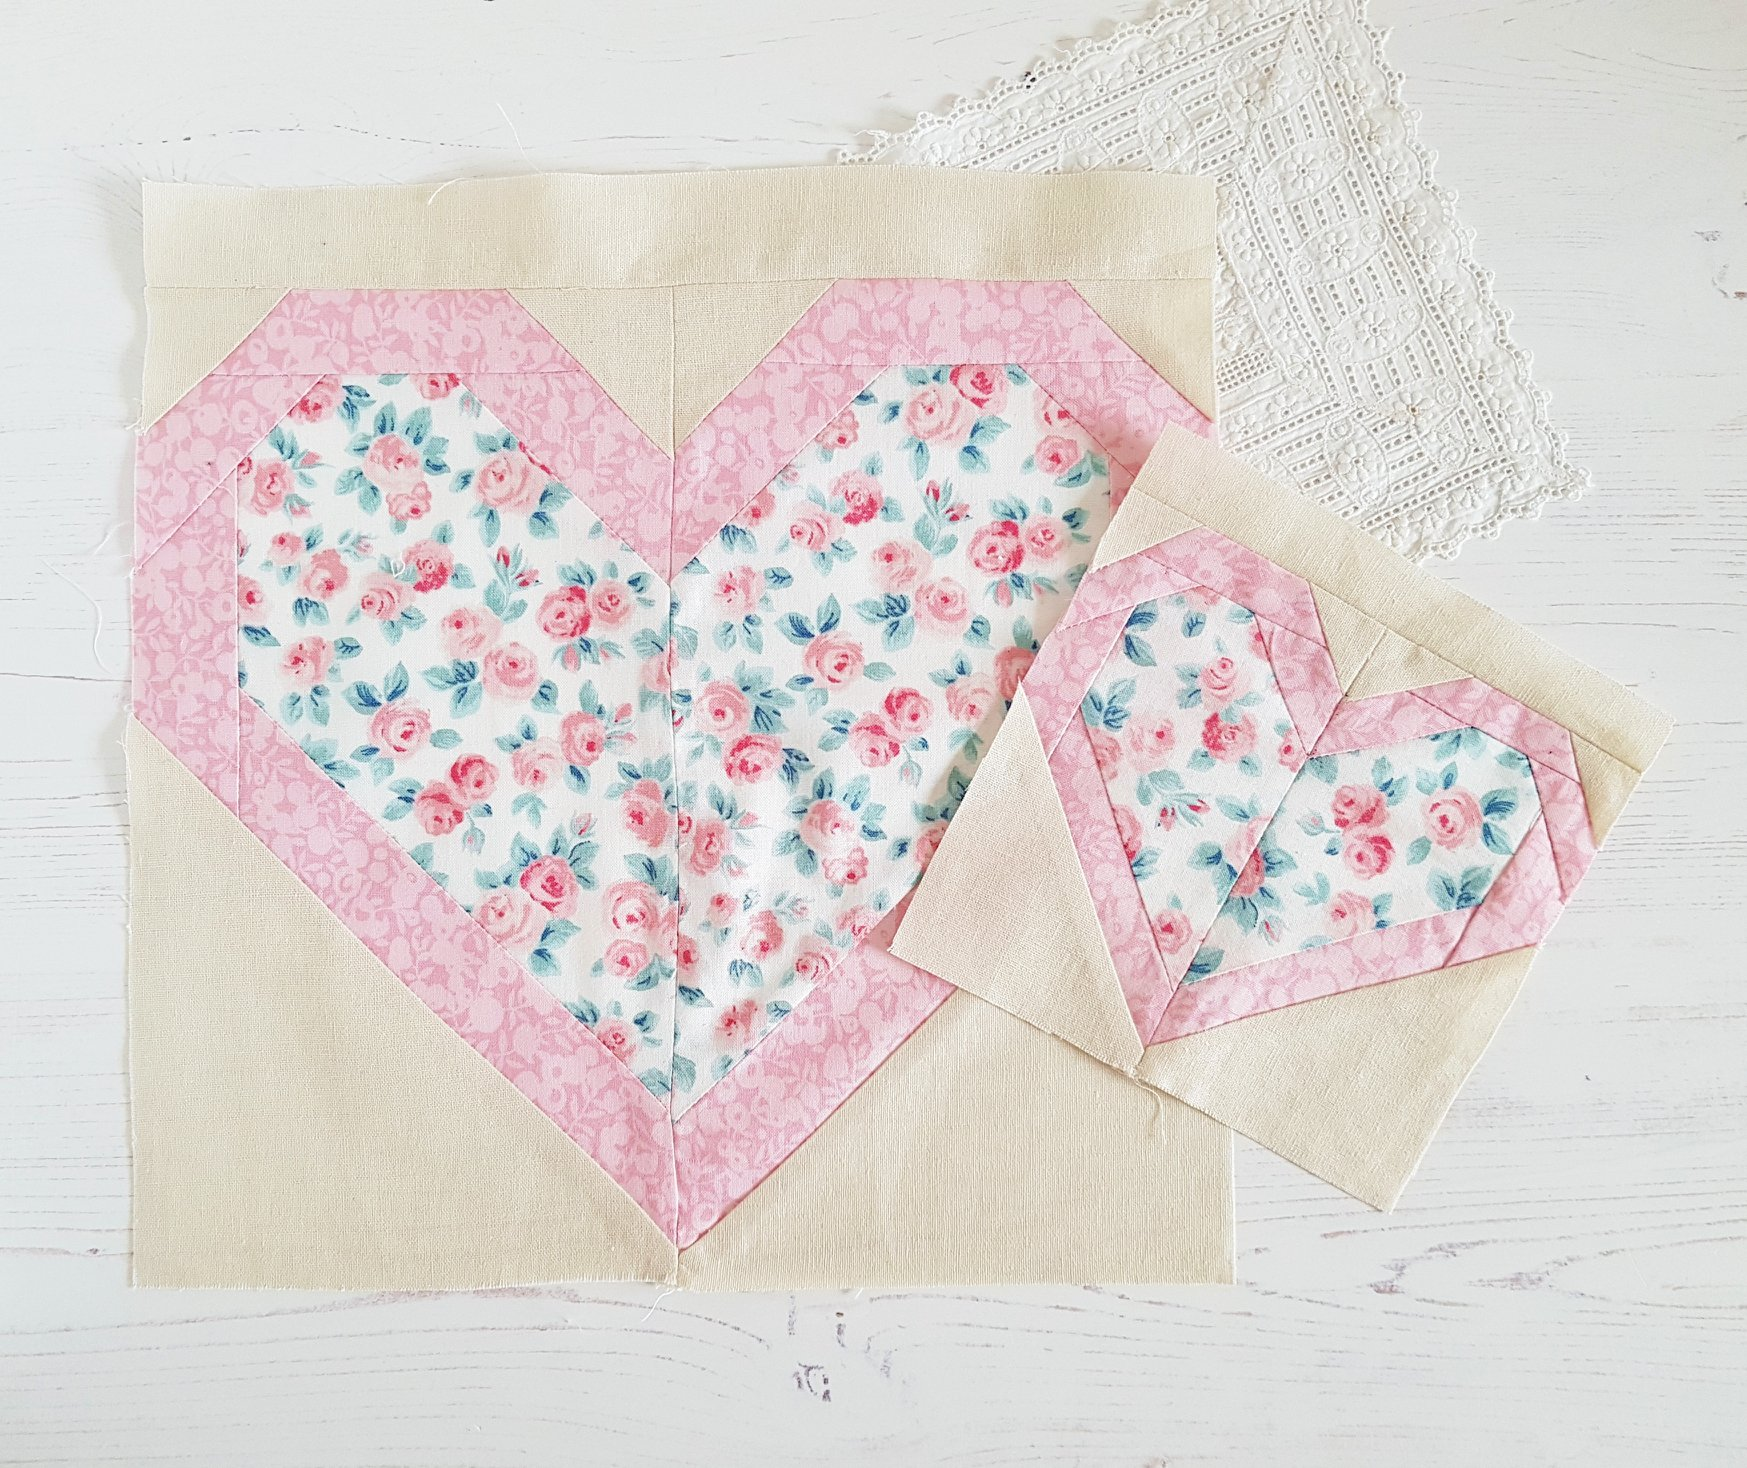 Heart Quilt Blocks